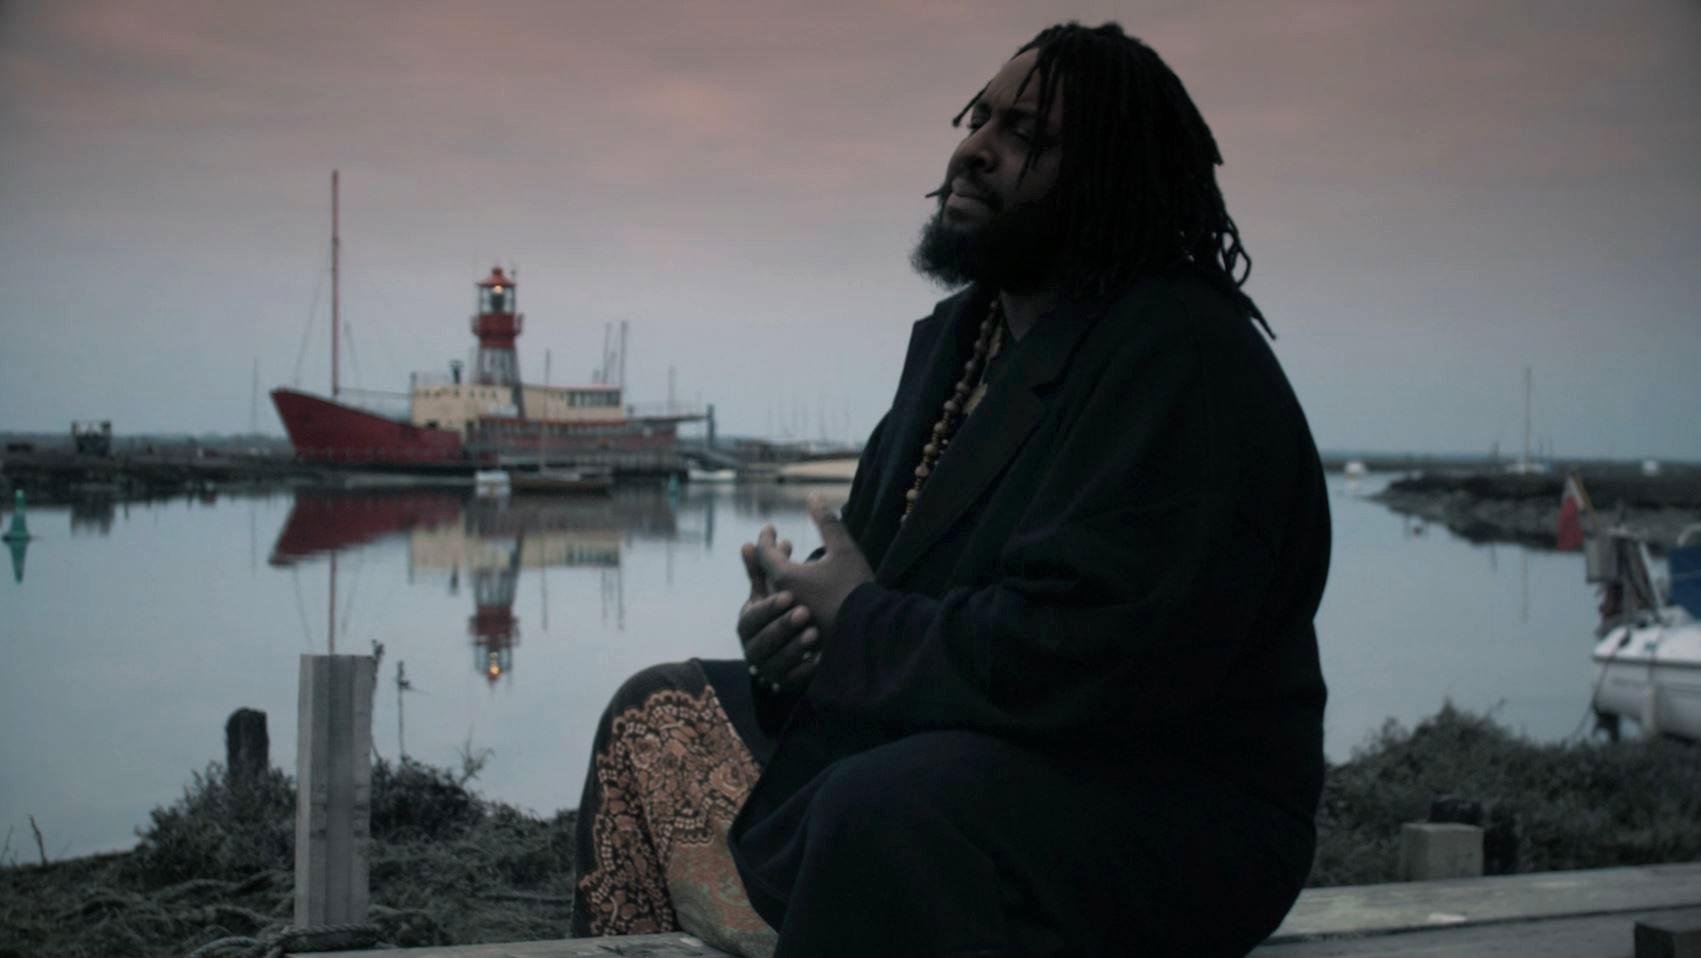 Soul Music Video